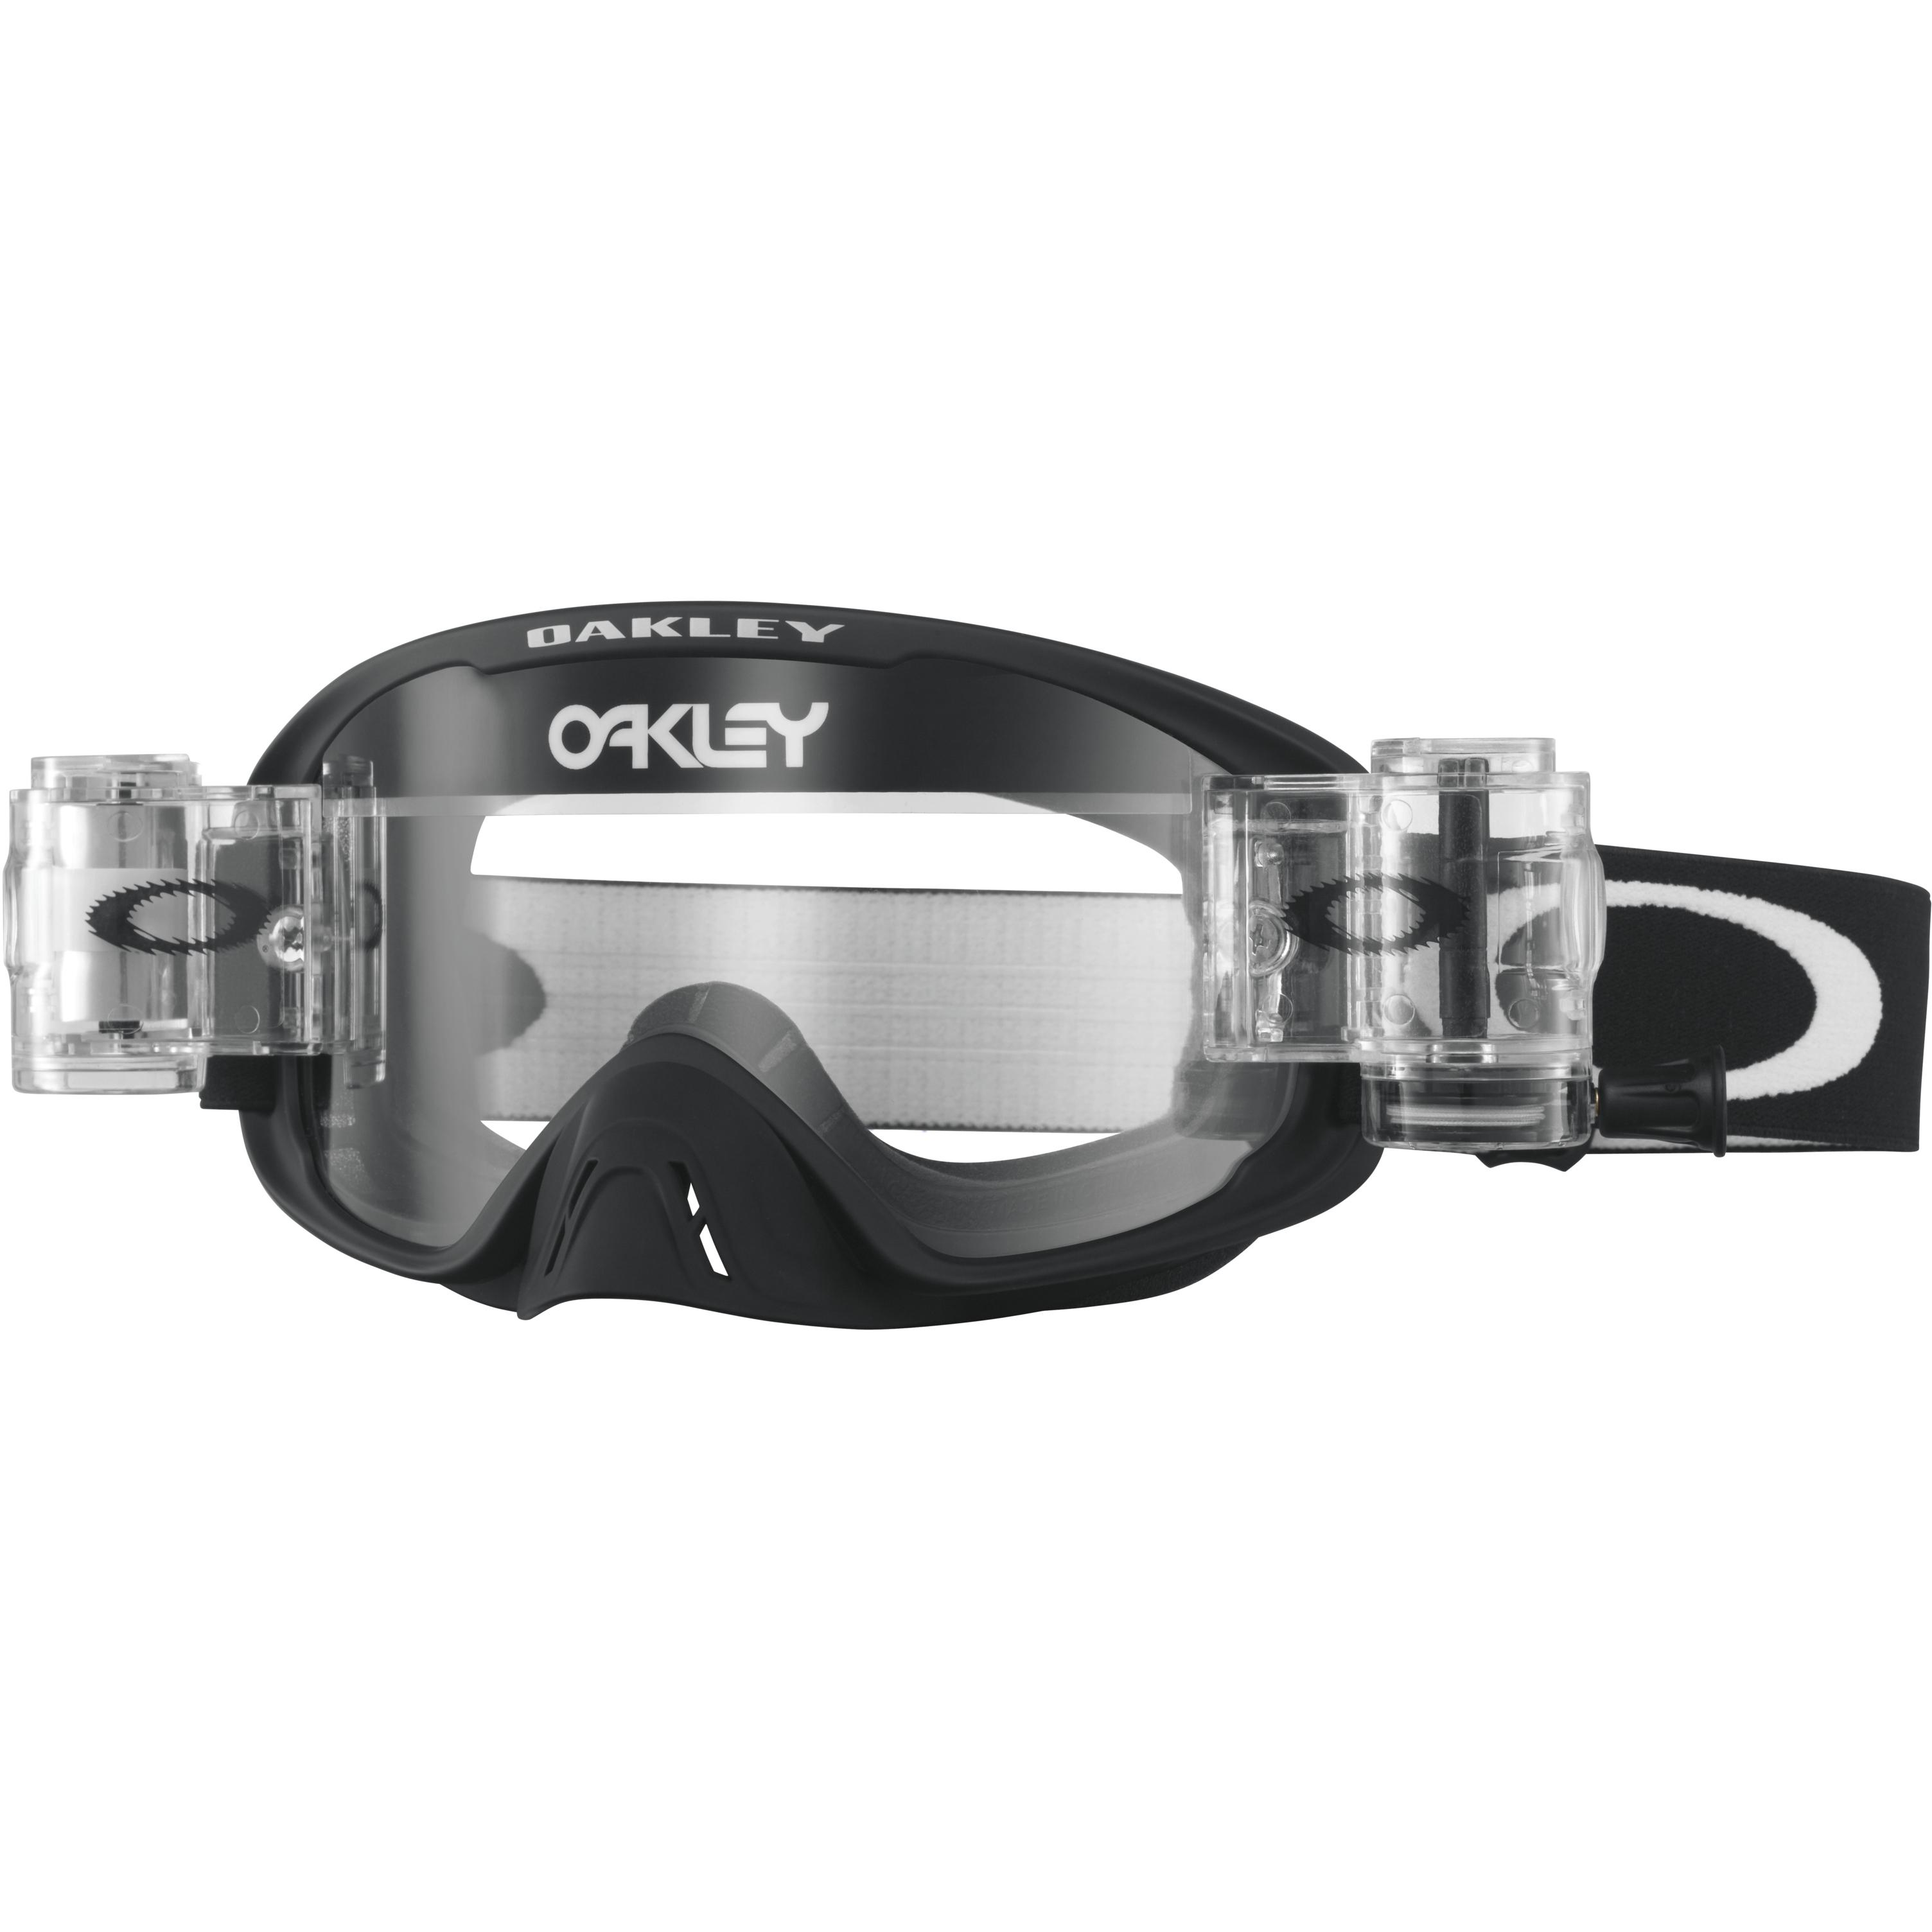 42b25df3e7a Oakley Goggles O2 MX Race-Ready Matte Black Clear lens Roll-Off ...